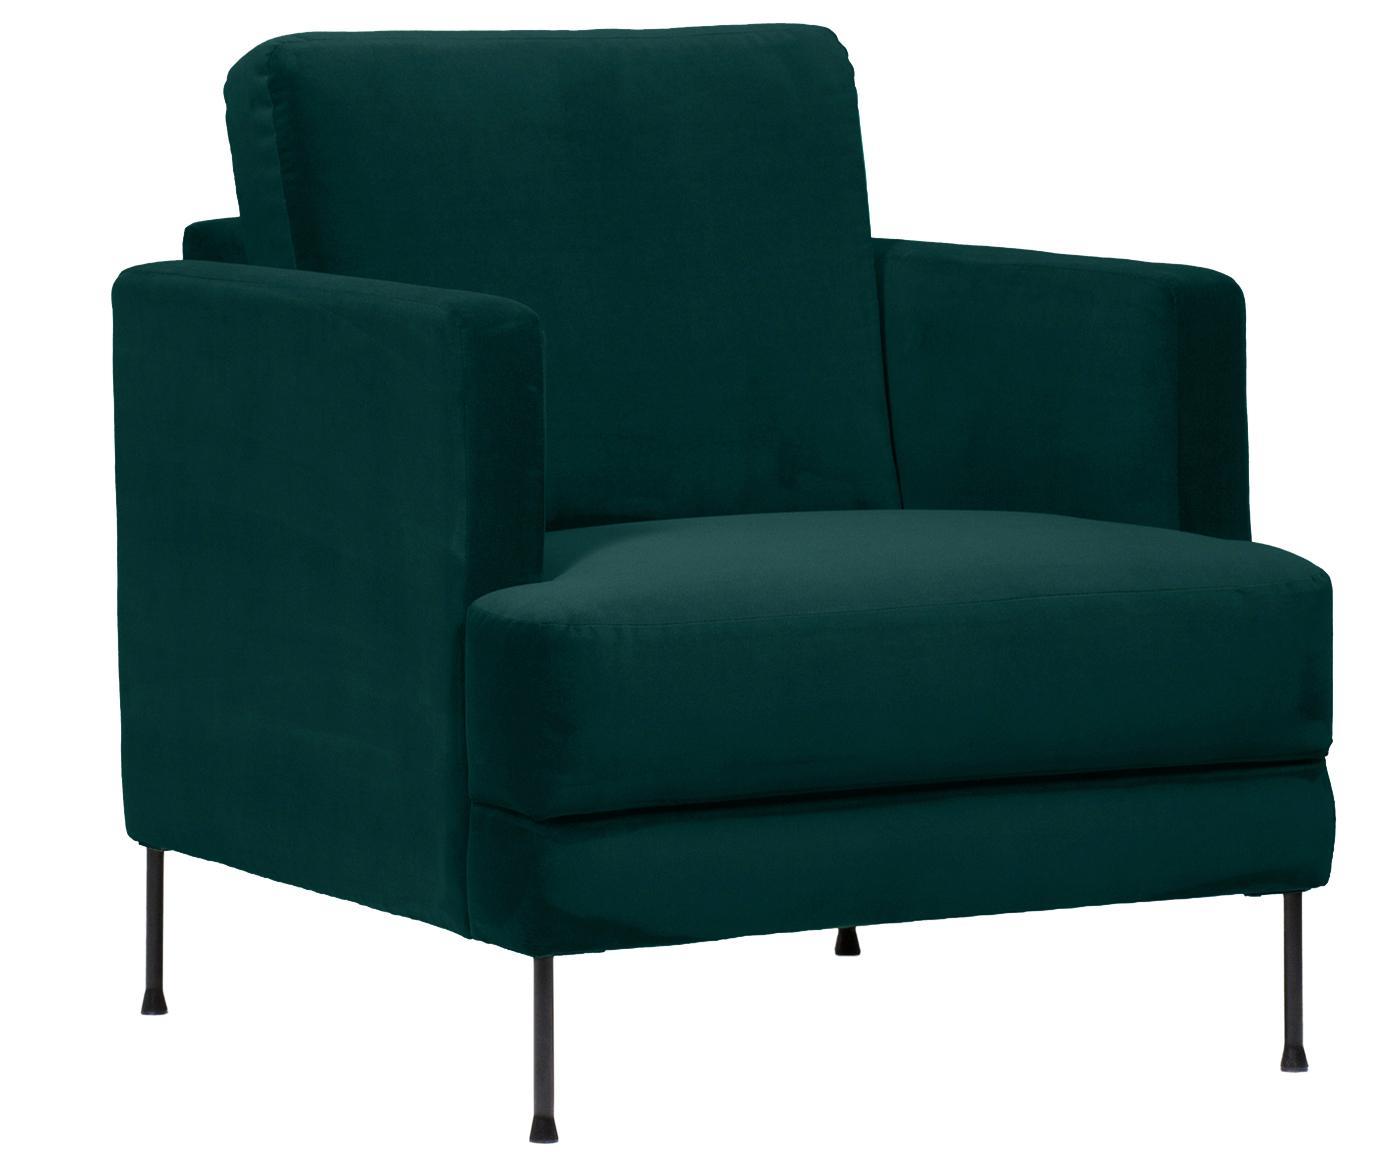 Fluwelen fauteuil Fluente, Bekleding: fluweel (hoogwaardig poly, Frame: massief grenenhout, Poten: gelakt metaal, Donkergroen, B 76 x D 83 cm